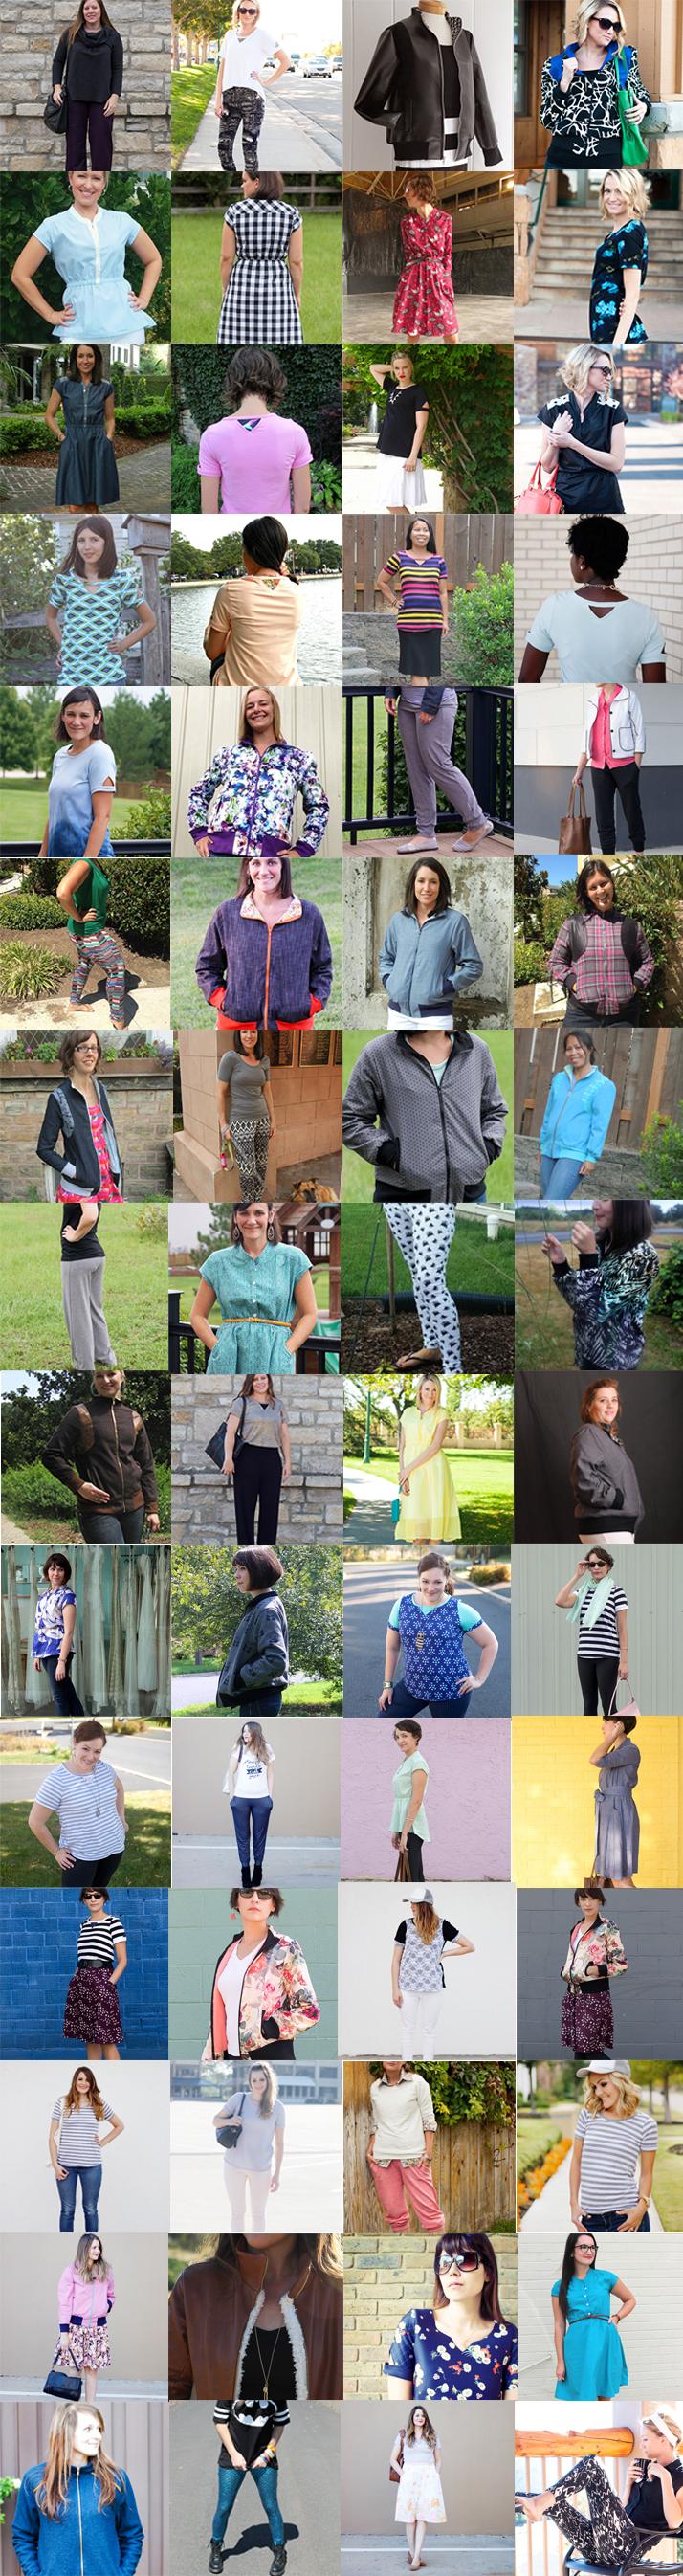 4 Patterns 60 Looks    8 Days A Week Collection    Shwin&Shwin